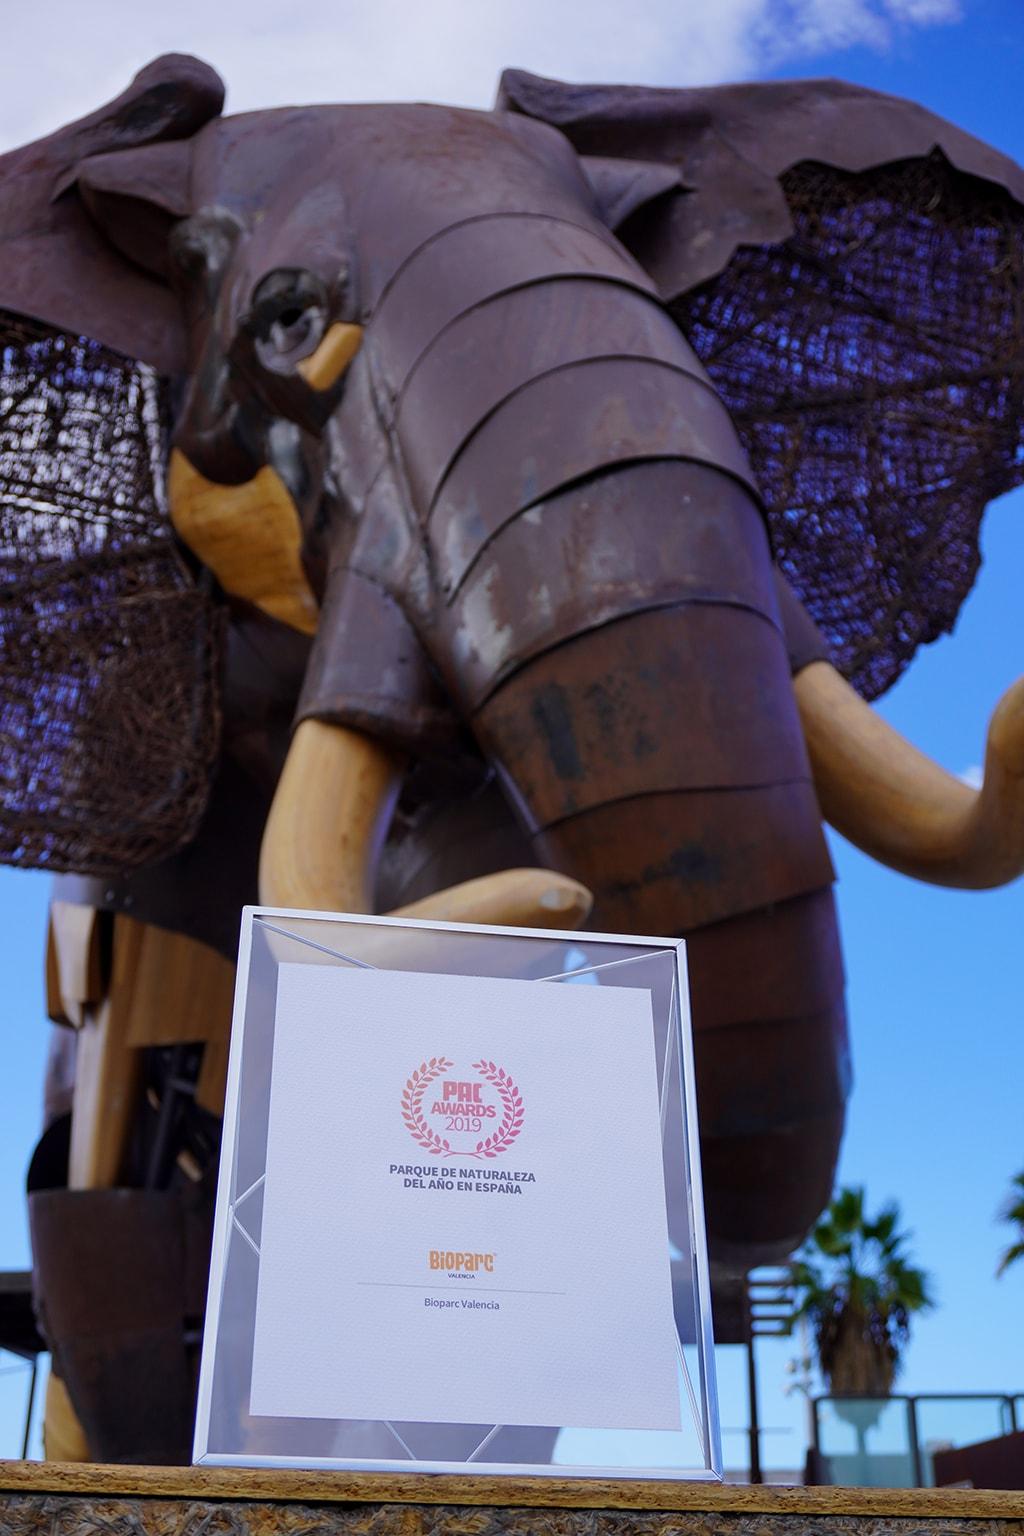 BIOPARC Valencia reconocido como Parque de Naturaleza Pac awards 2019